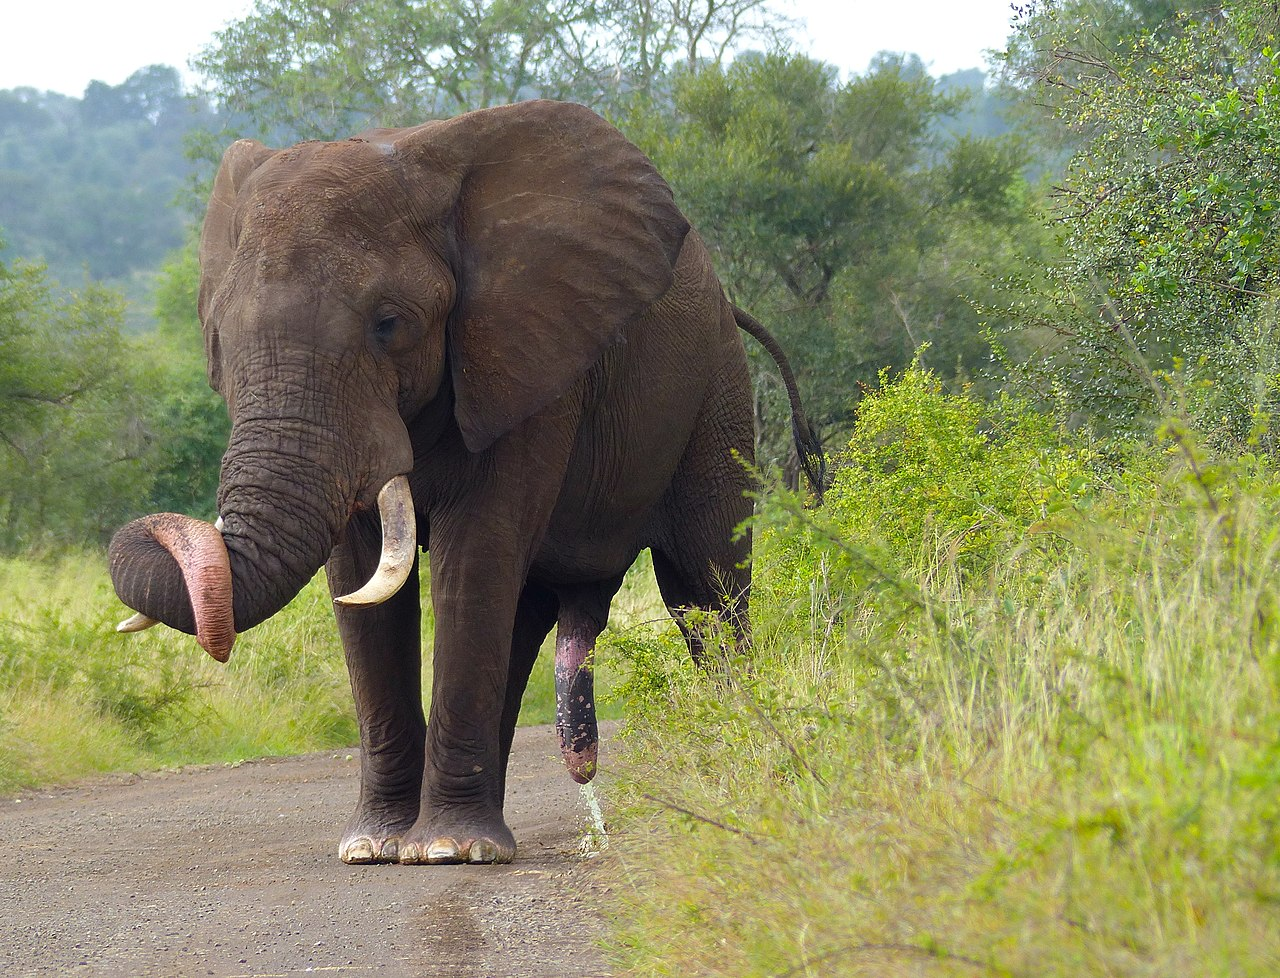 File:elephant loxodonta africana male im quite sure pa i ssing